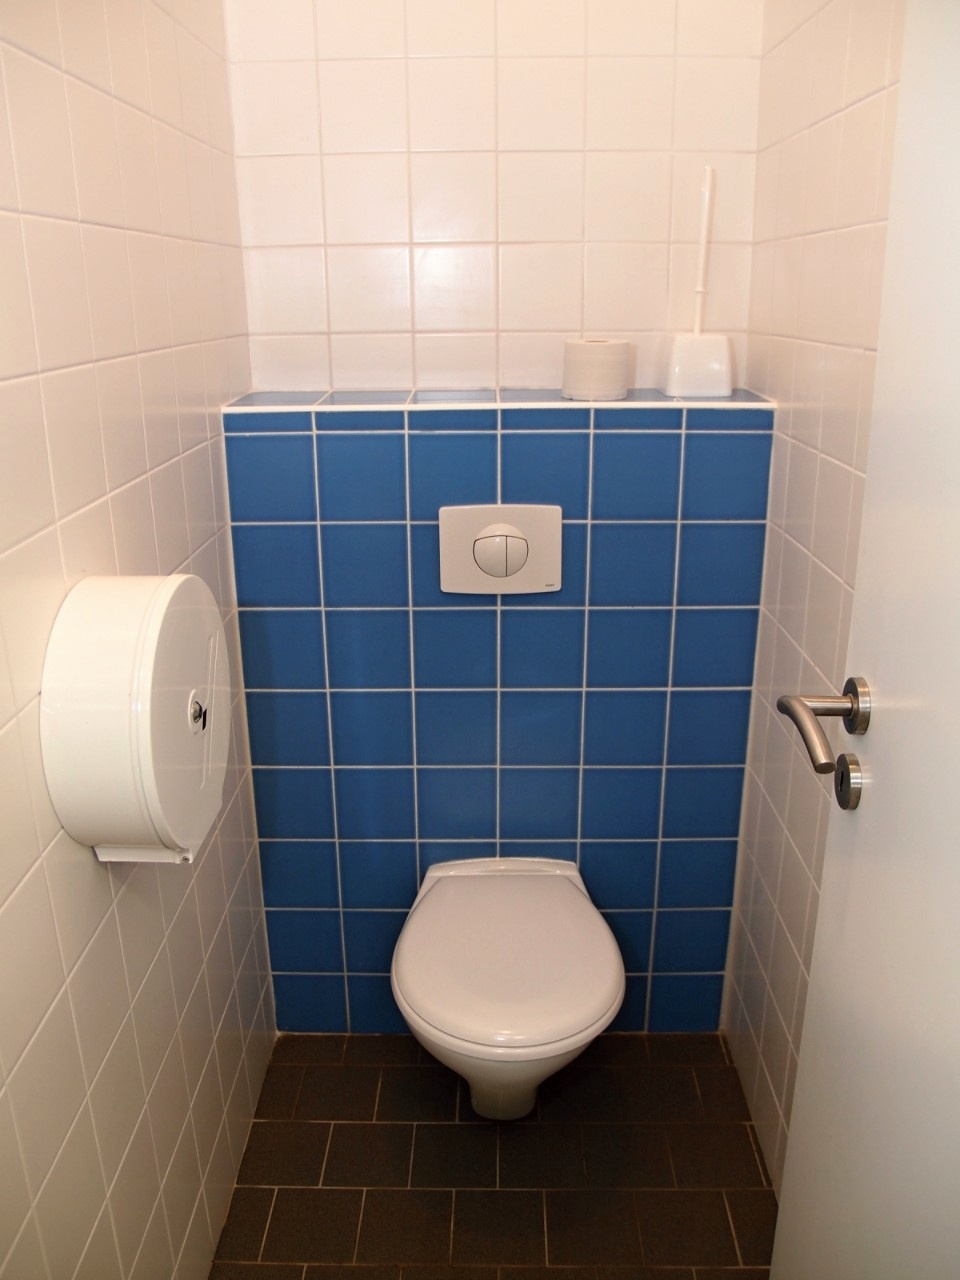 WC (chlapci)